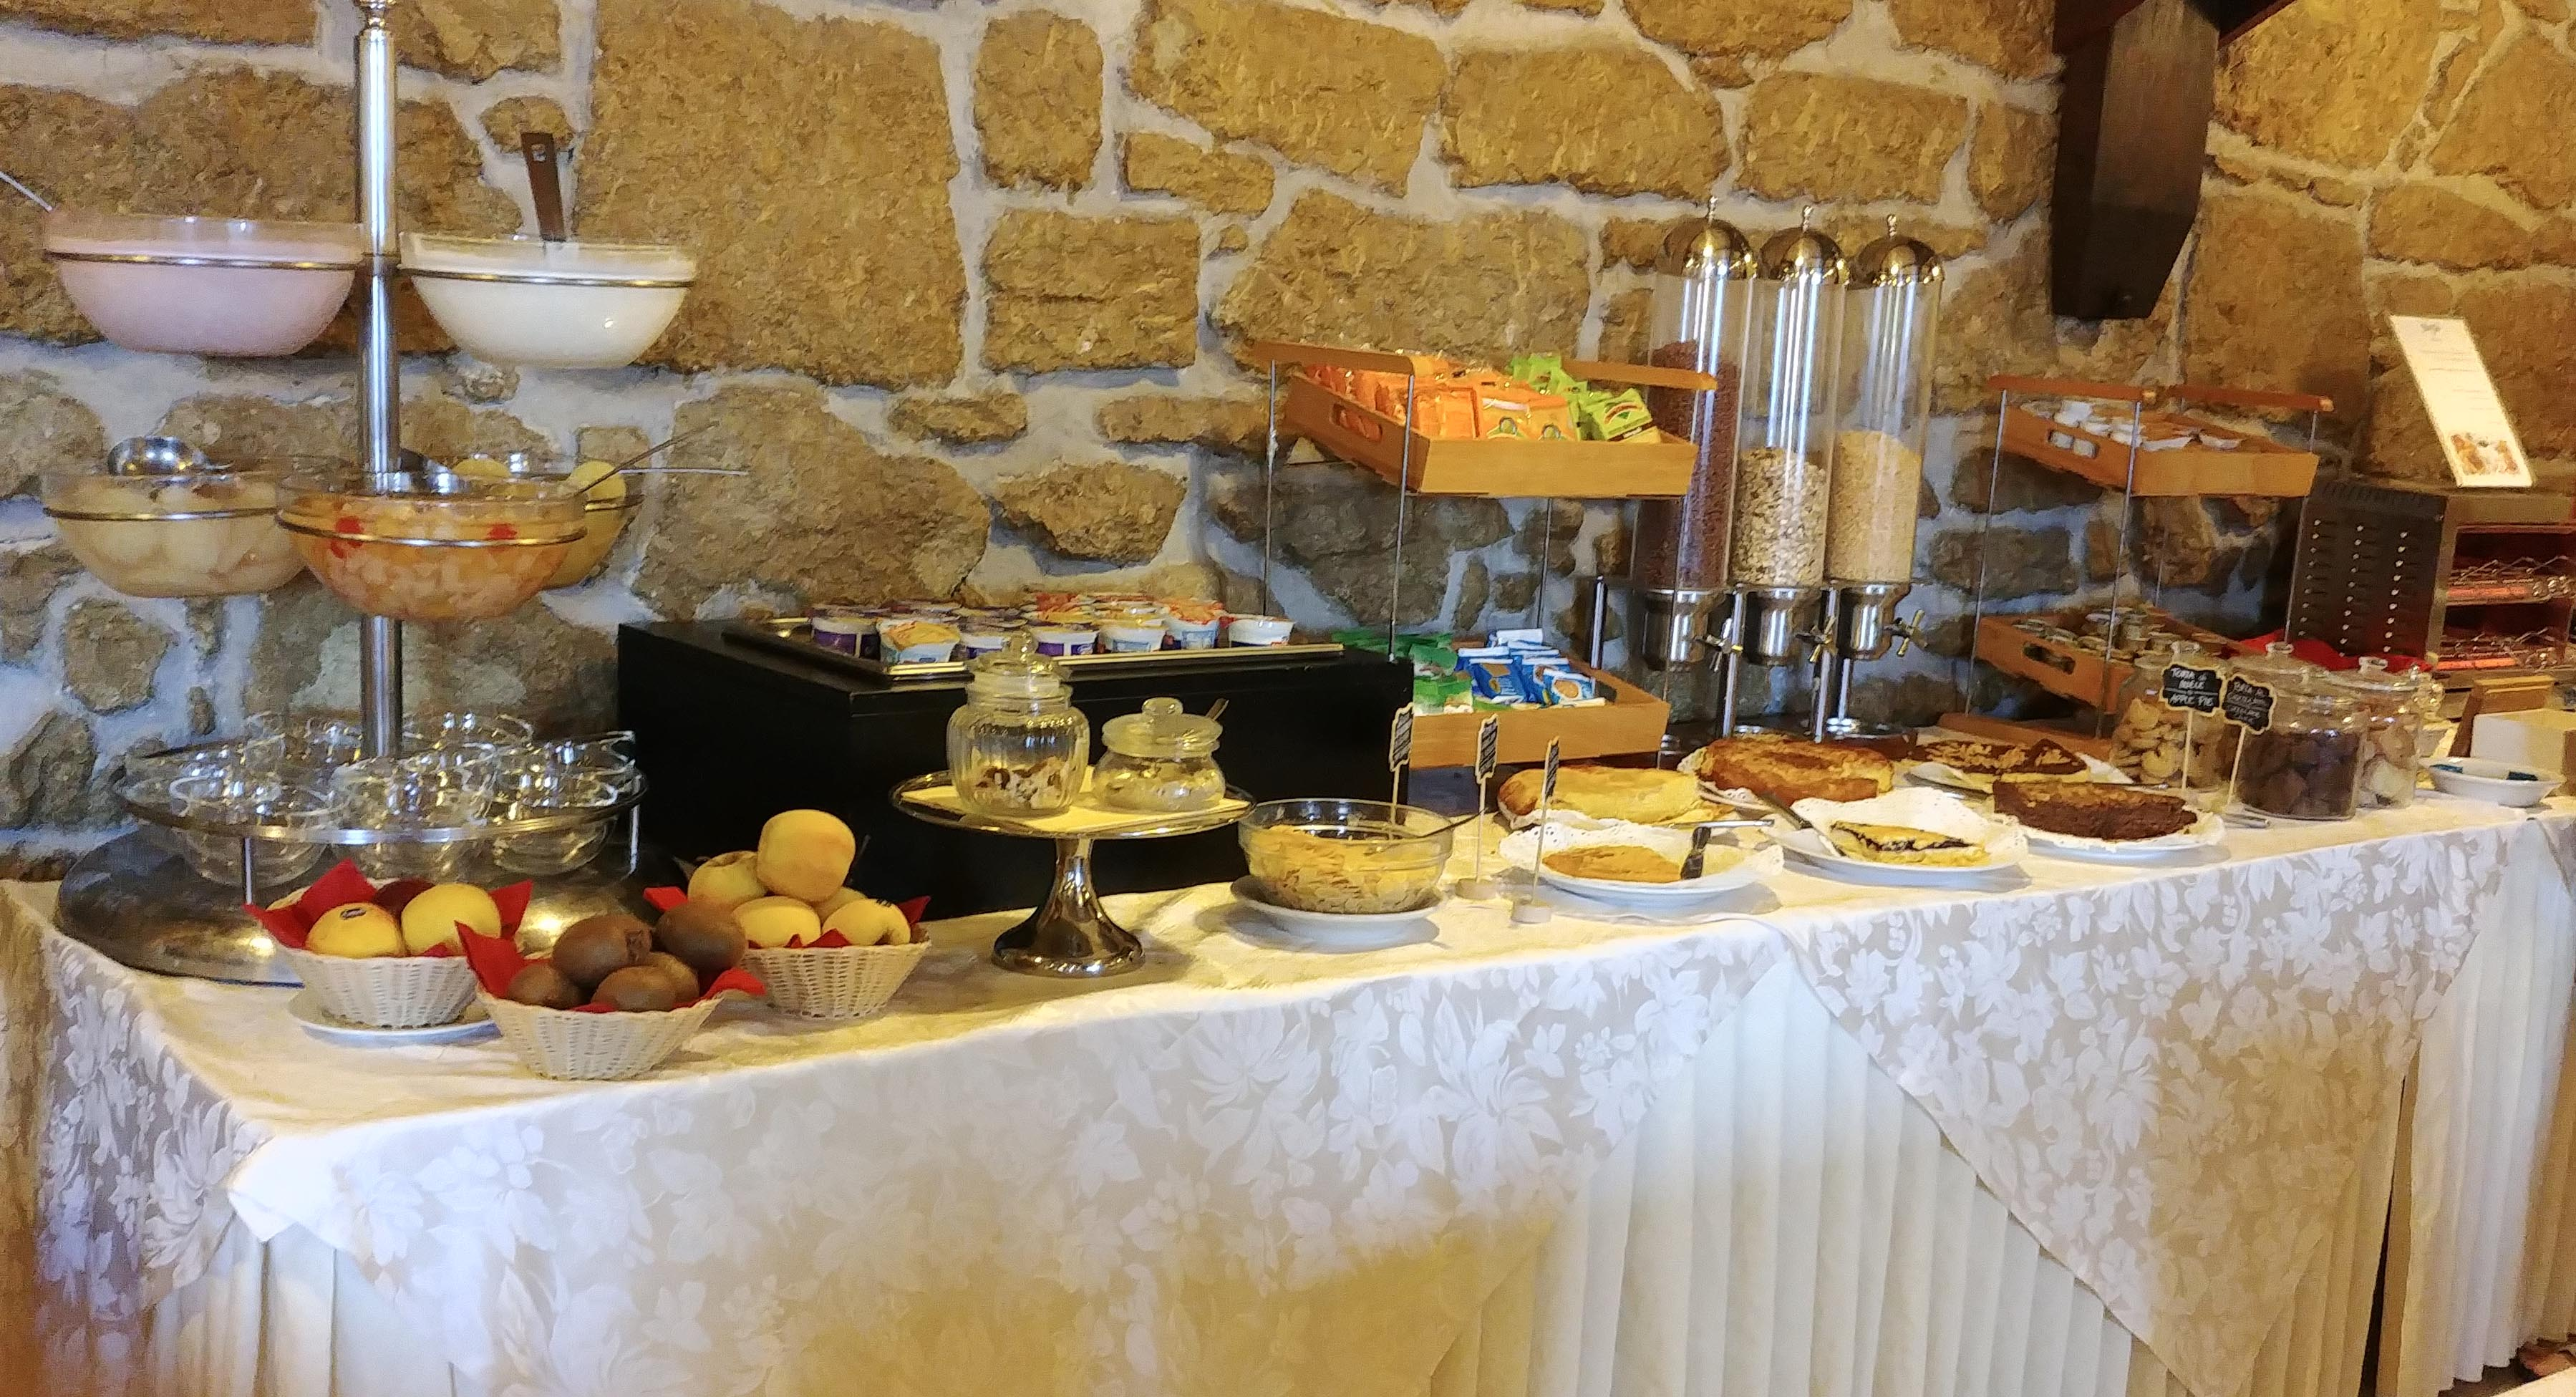 Breakfast spread at Hotel Joli